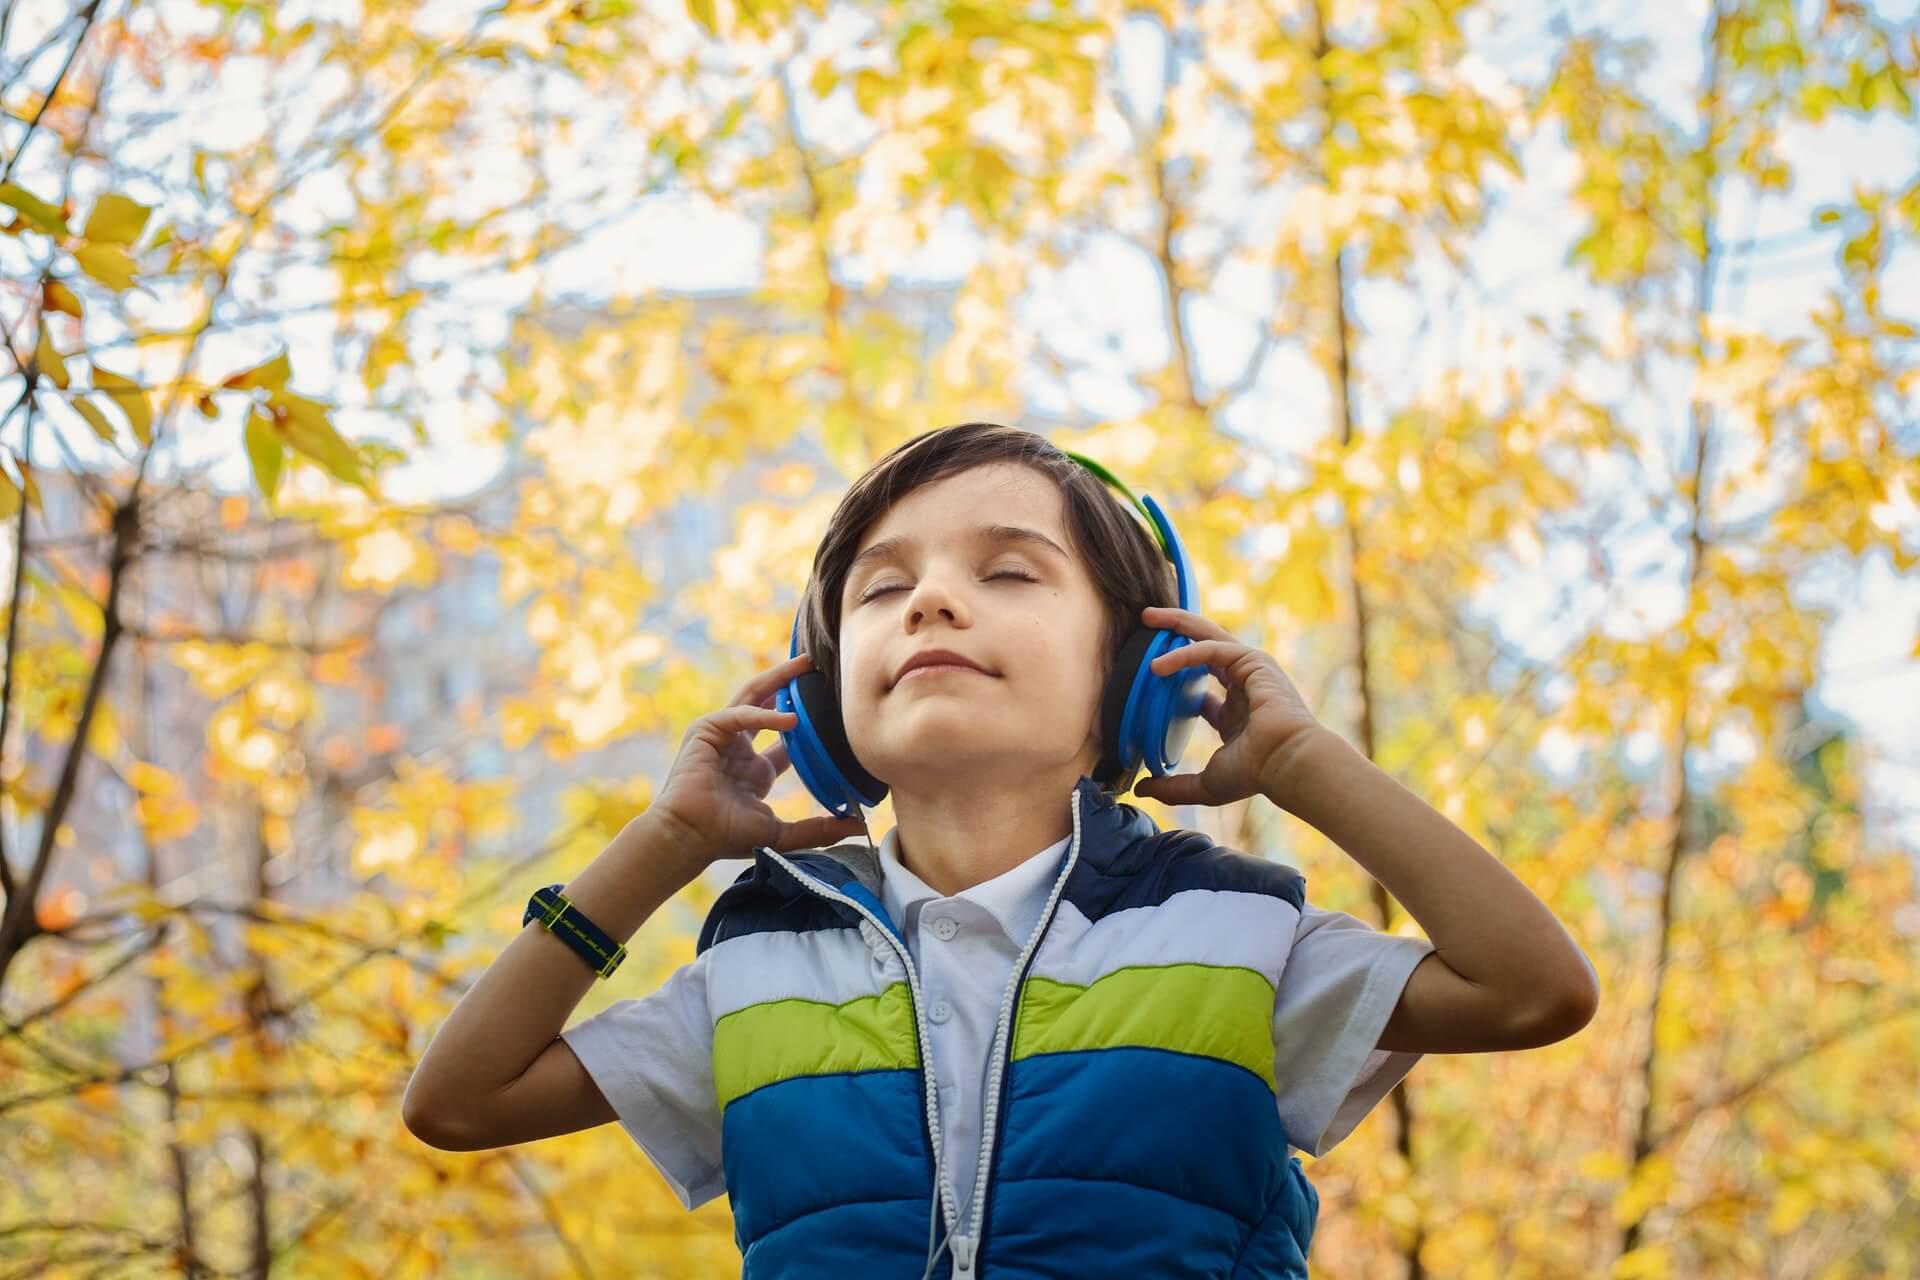 Clases de música para niños, beneficios